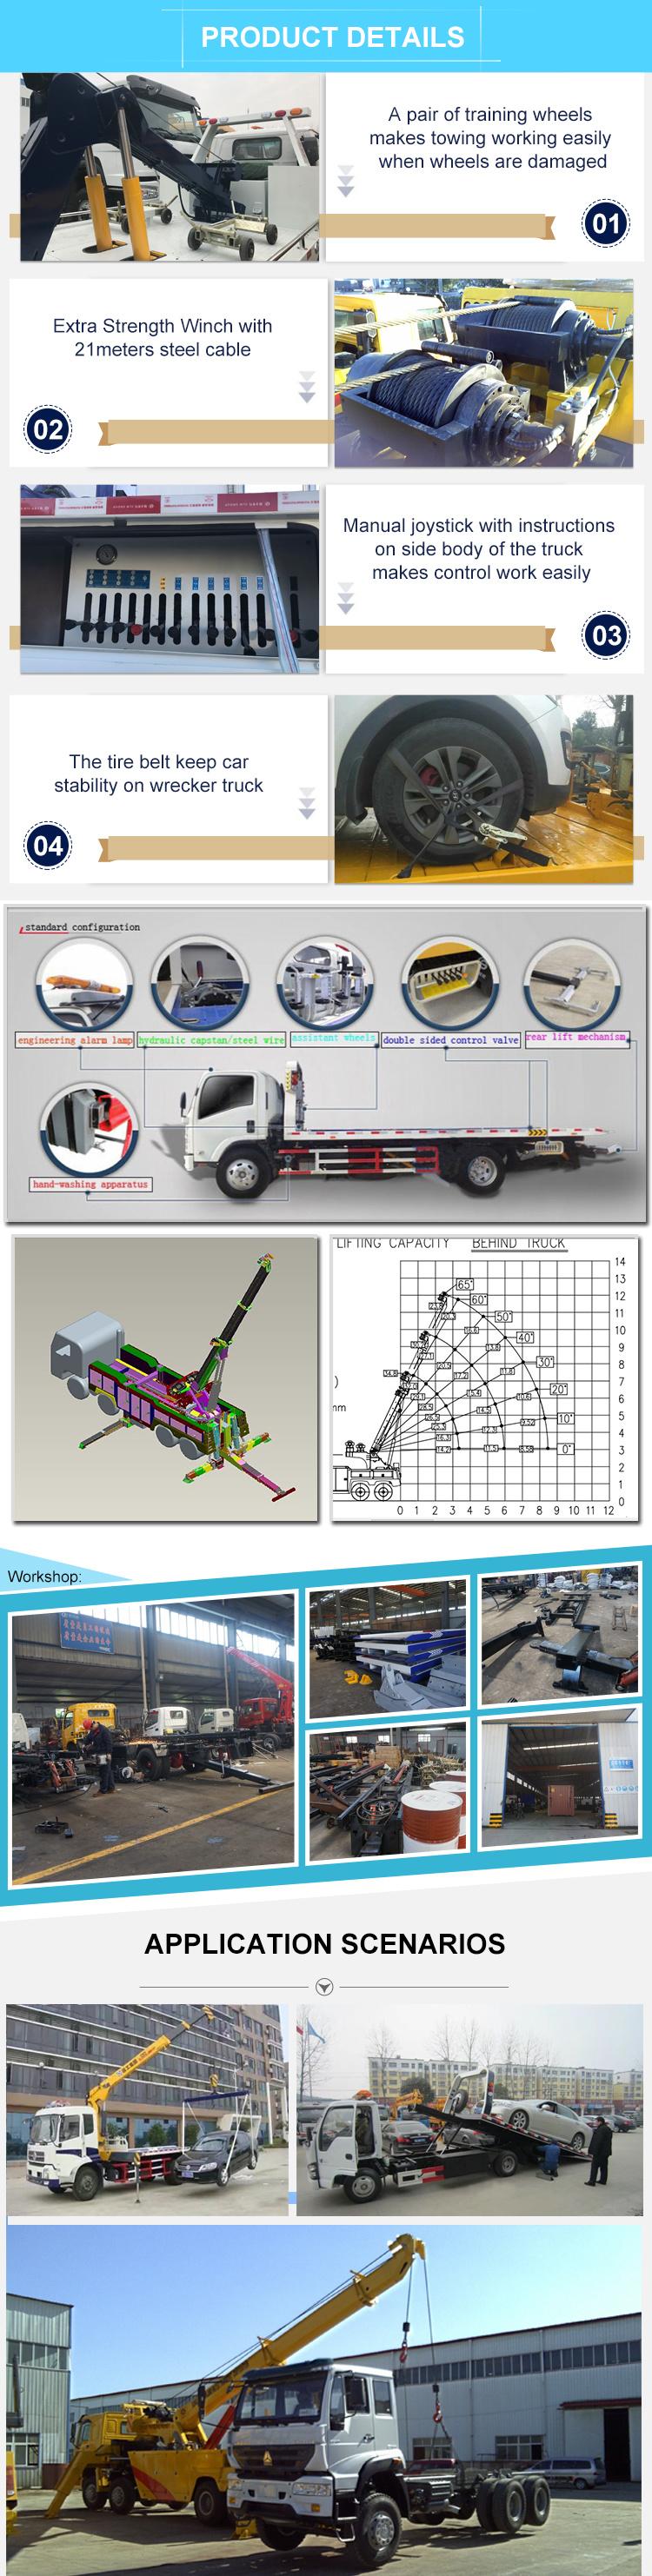 Do<em></em>ngfeng Isuzu 5 Ton Wrecker Road Tow Recovery Flatebed Towing Truck